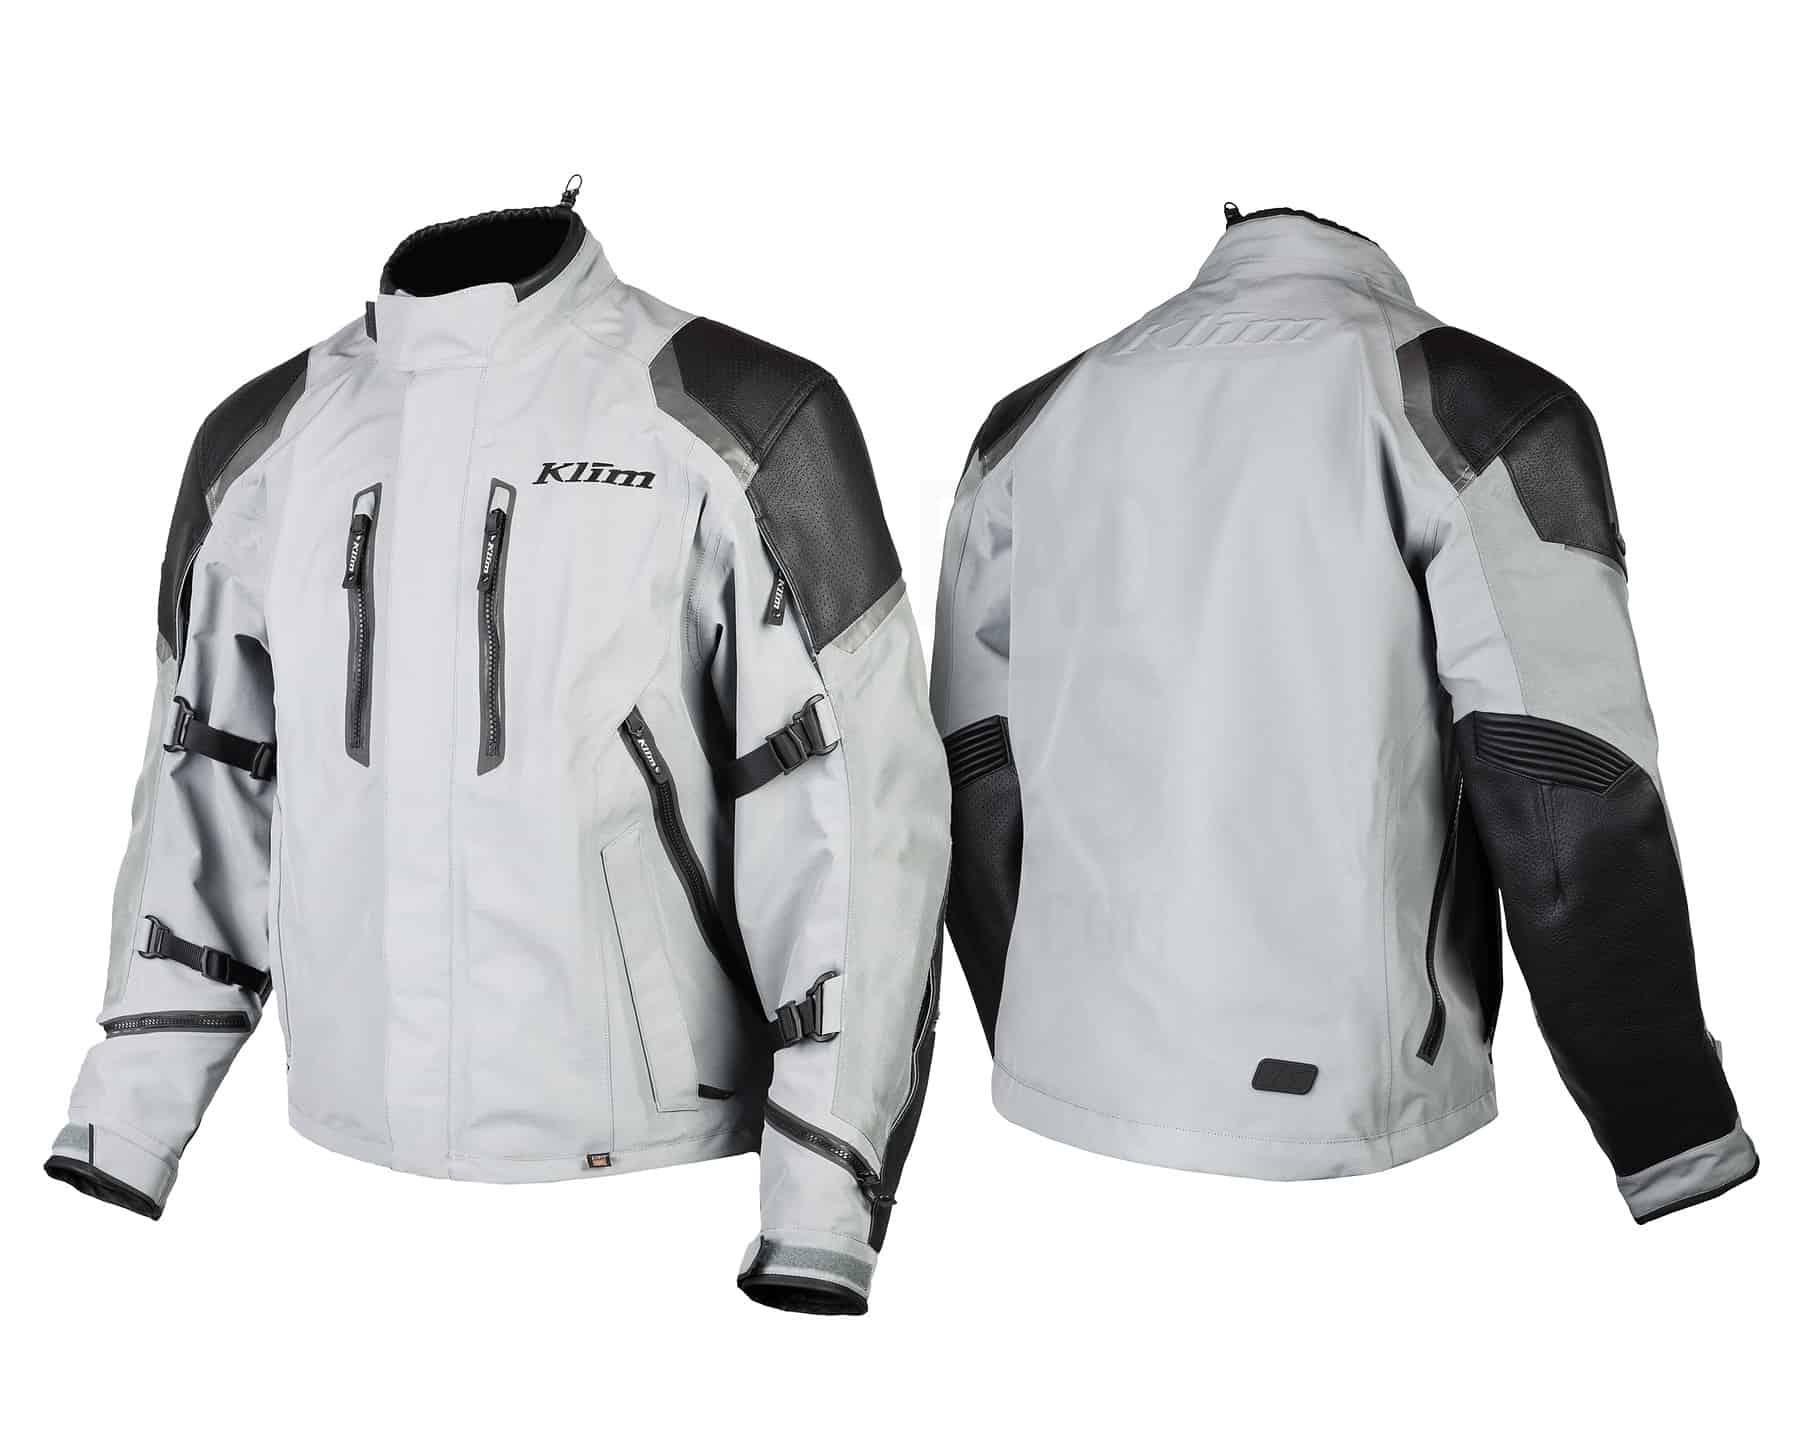 S Apex Jacket 3052-000-000_03